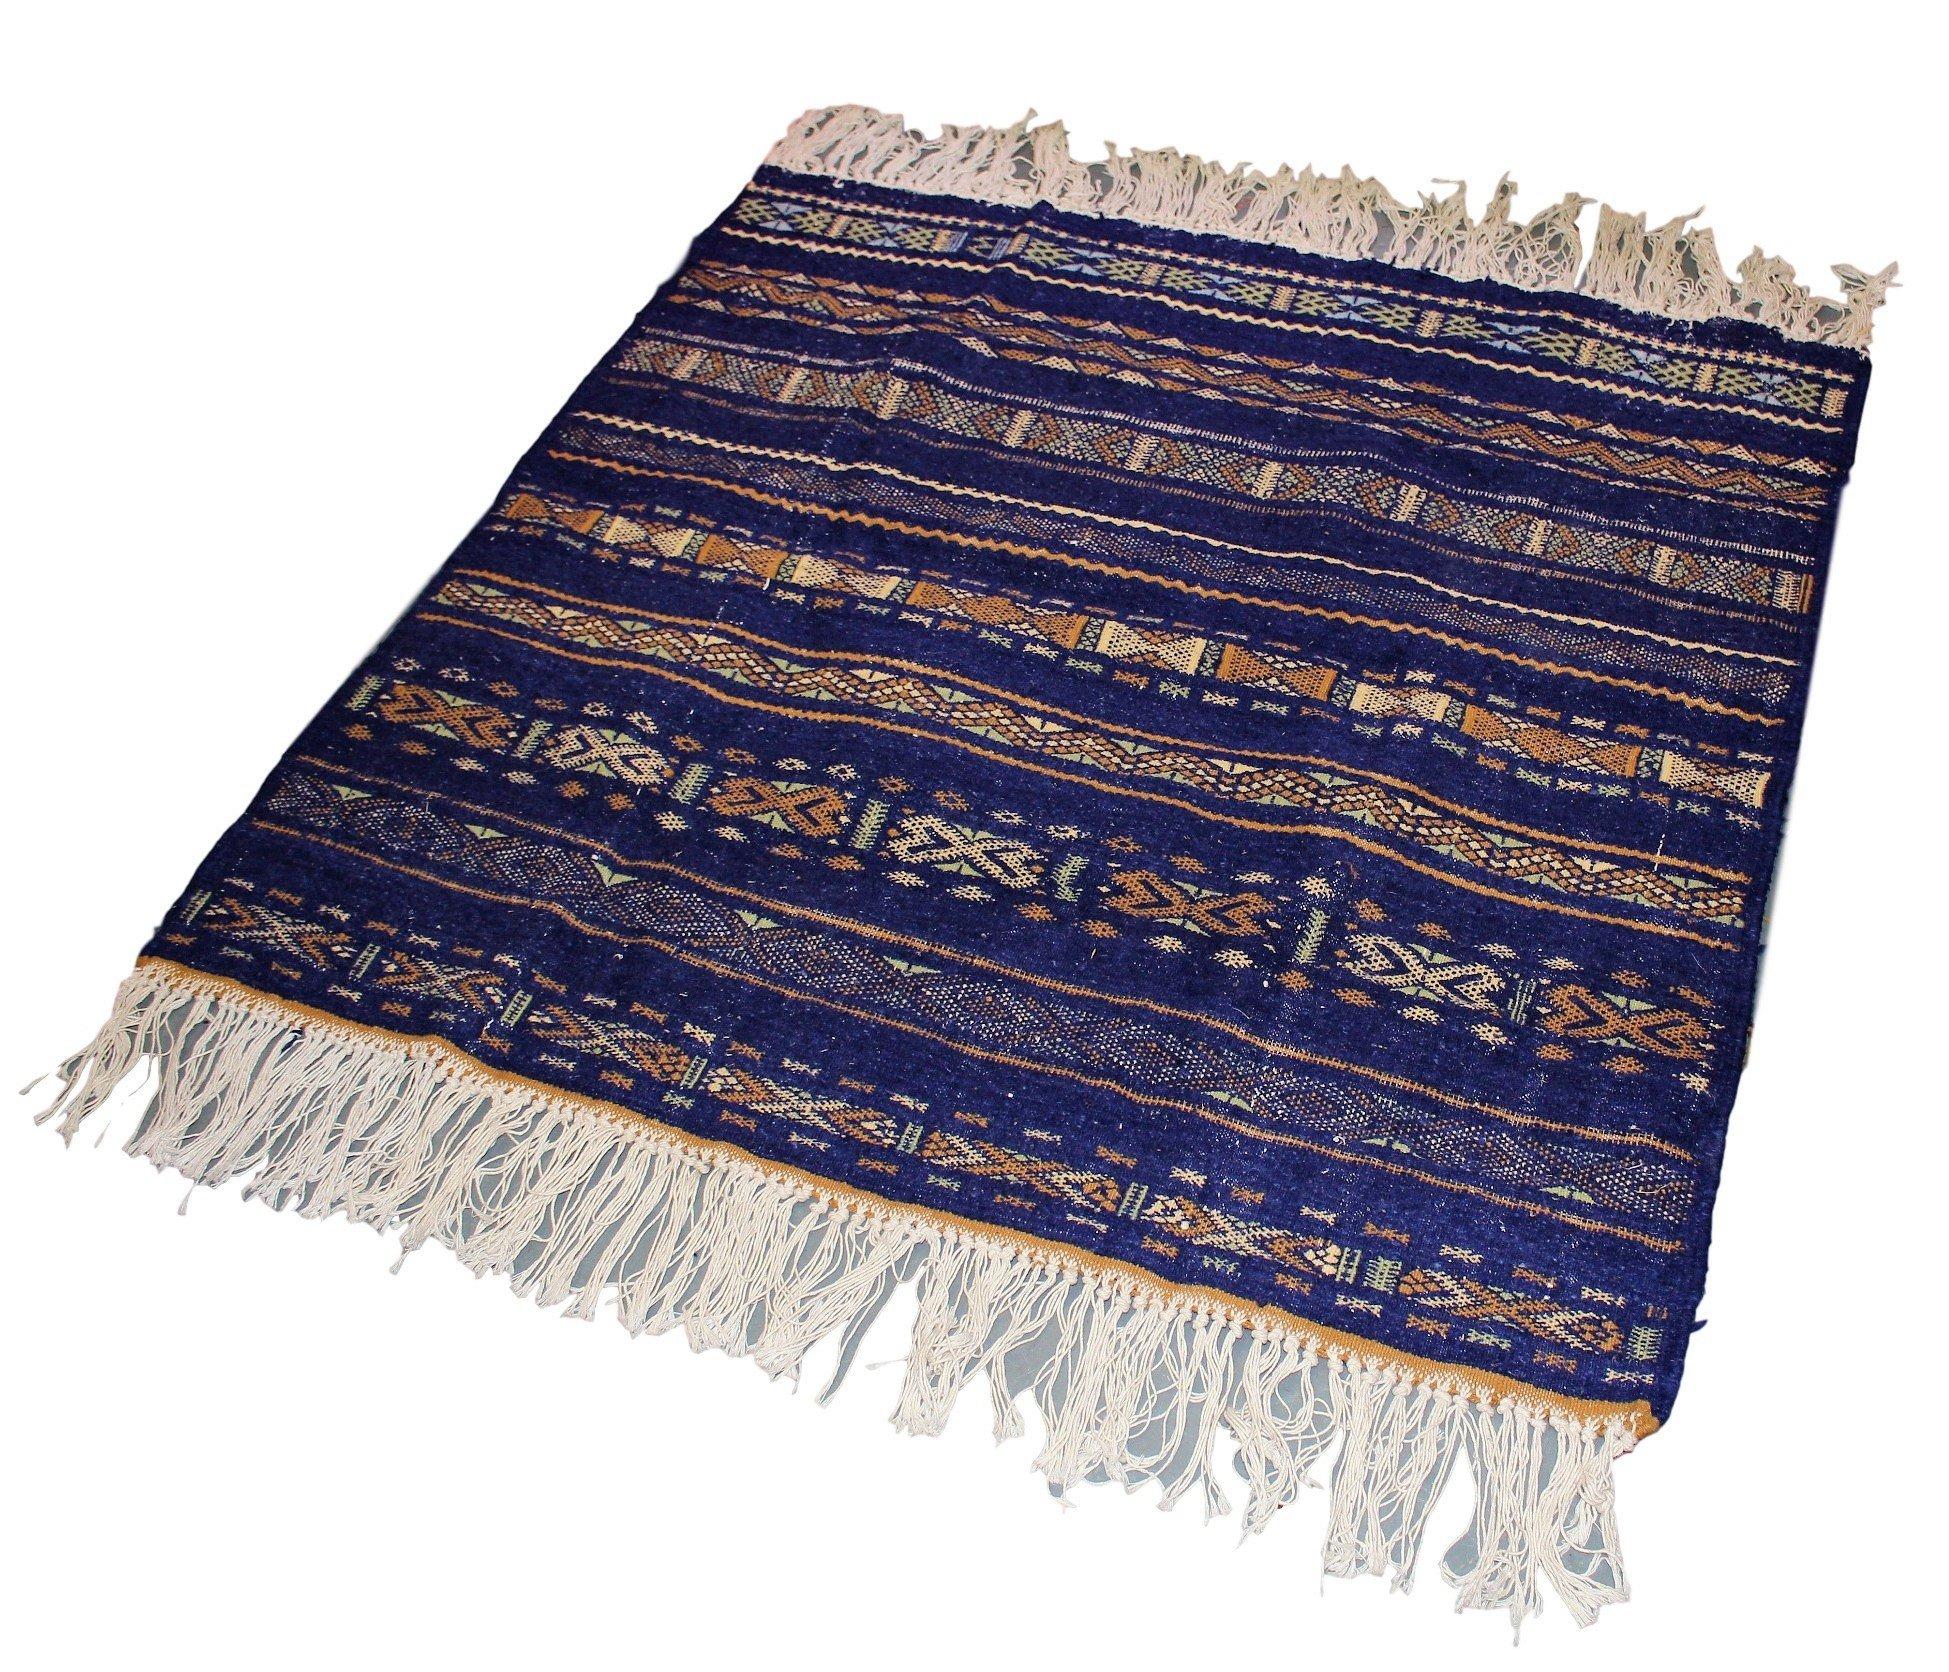 Authentic Moroccan Handmade Handwoven Kilim 100% Wool Rug